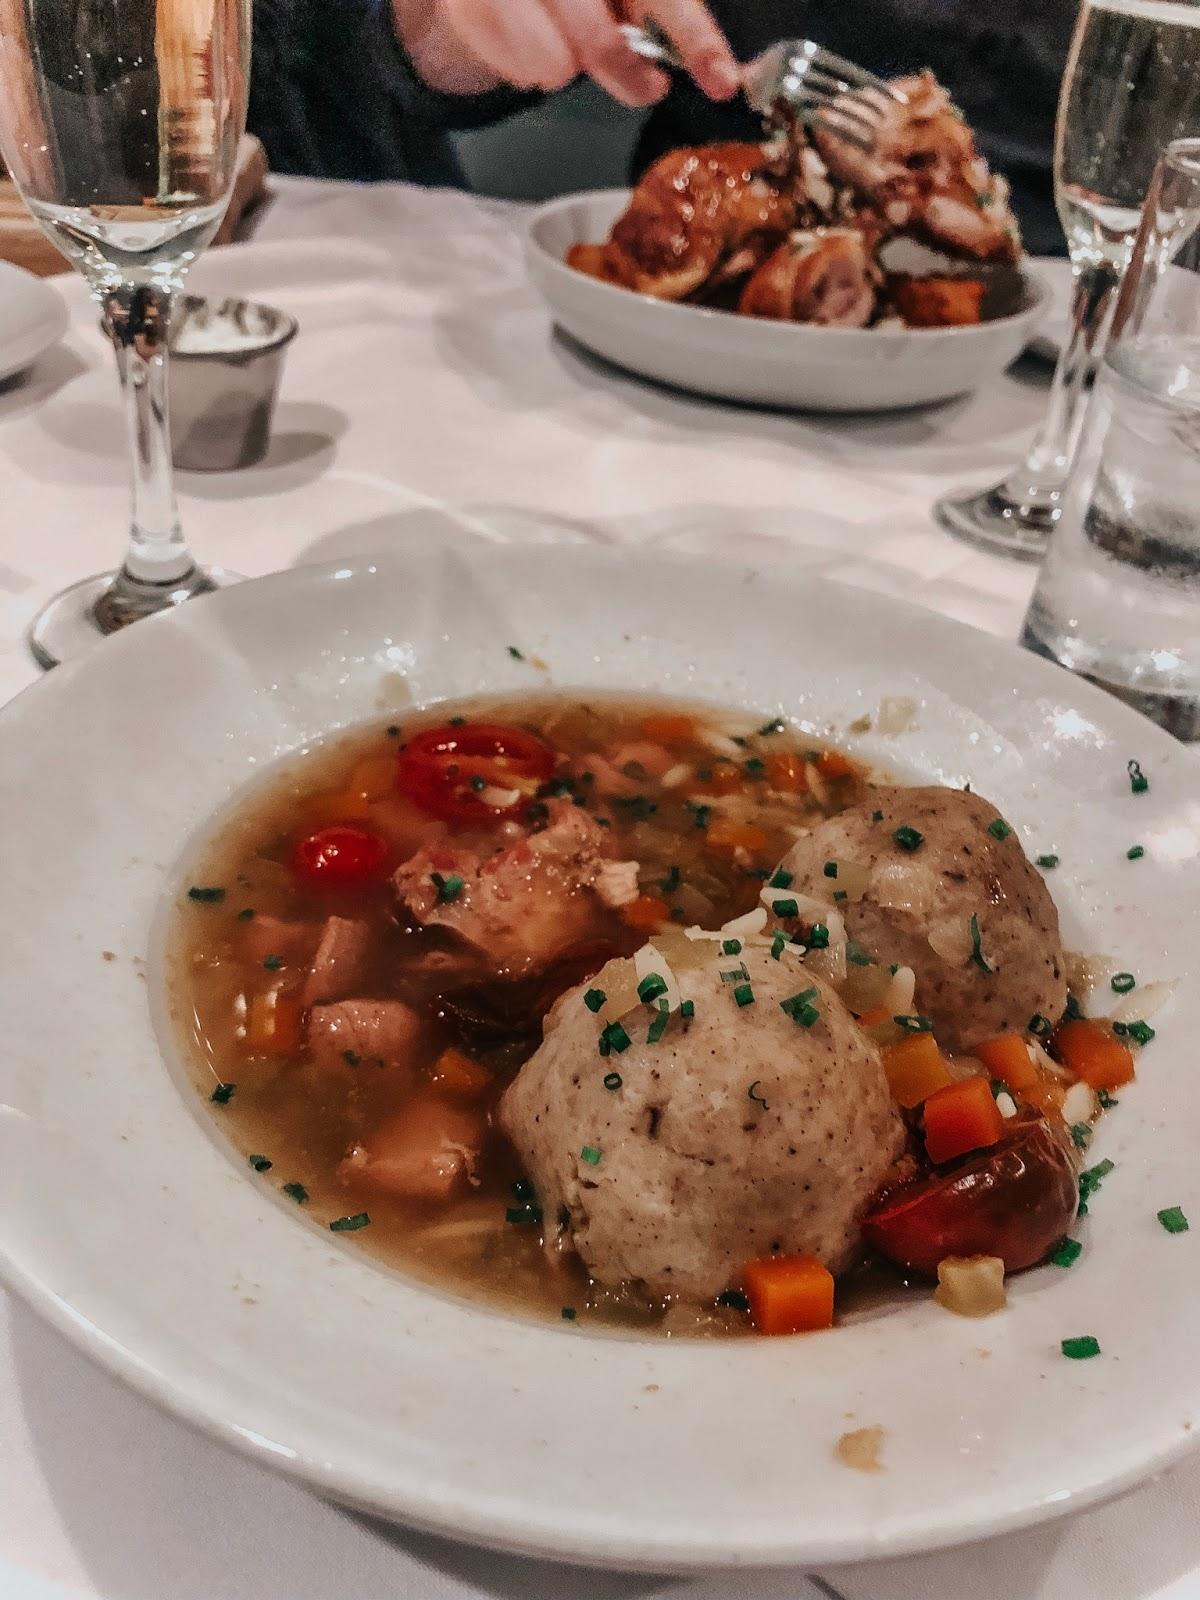 Matzo Ball & Roast Chicken Soup for dinner from Luke's in New Orleans